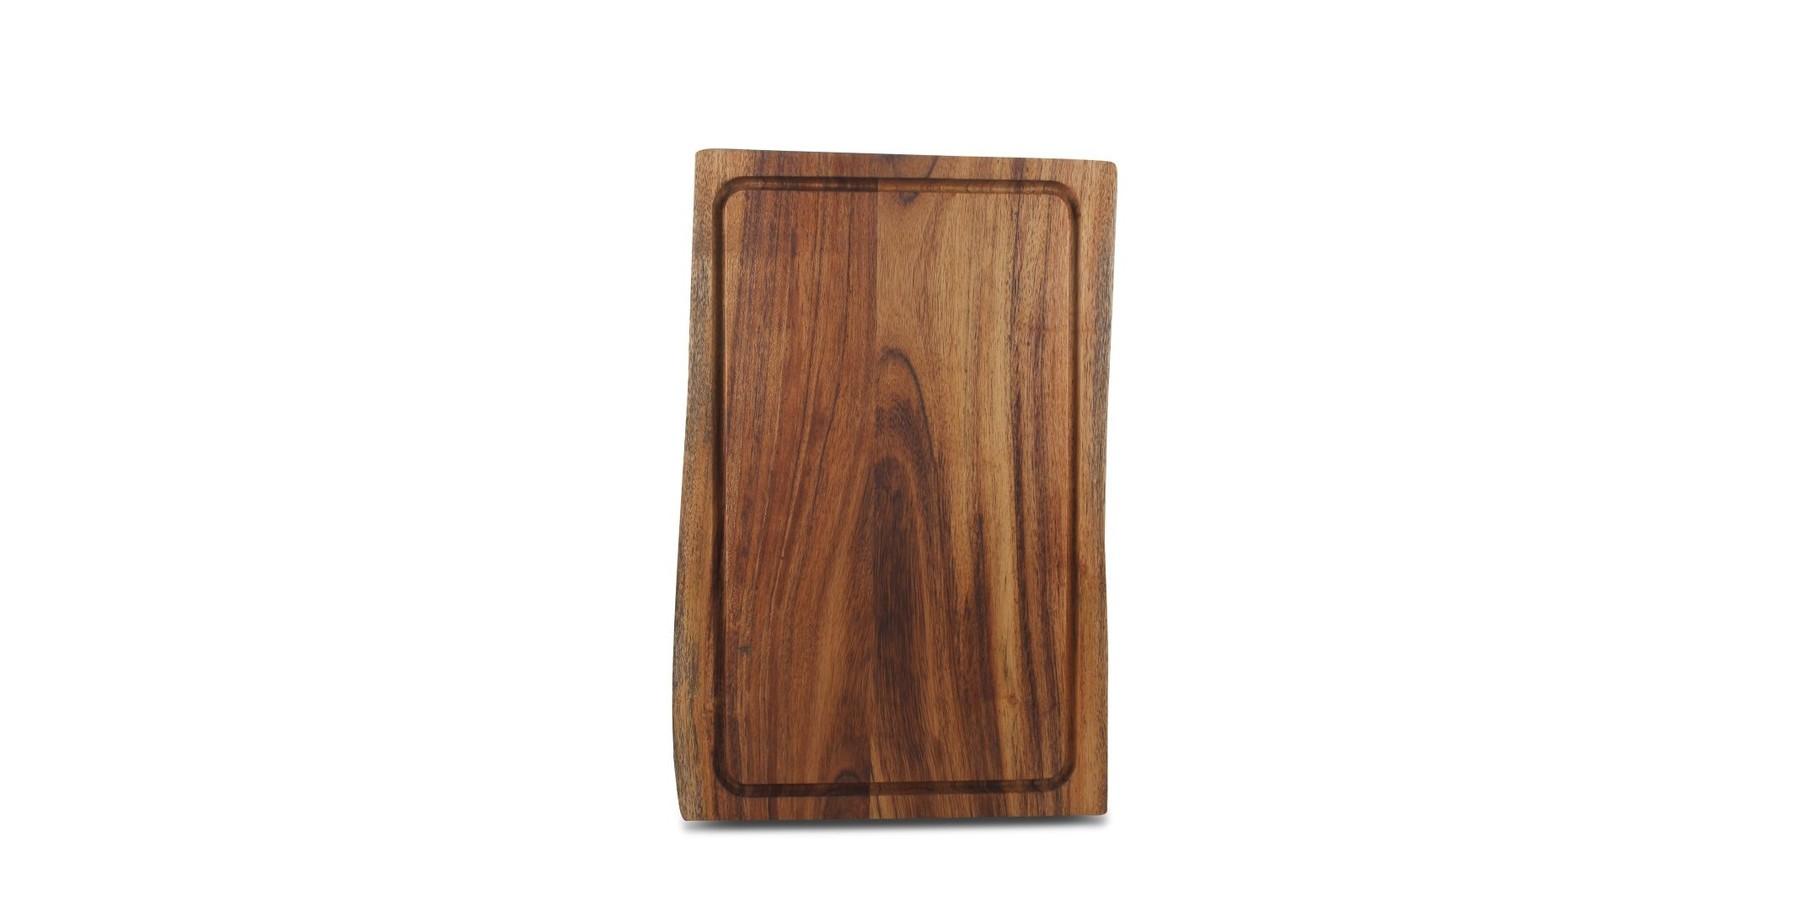 Board RAW 25x40 cm oiled Acacia